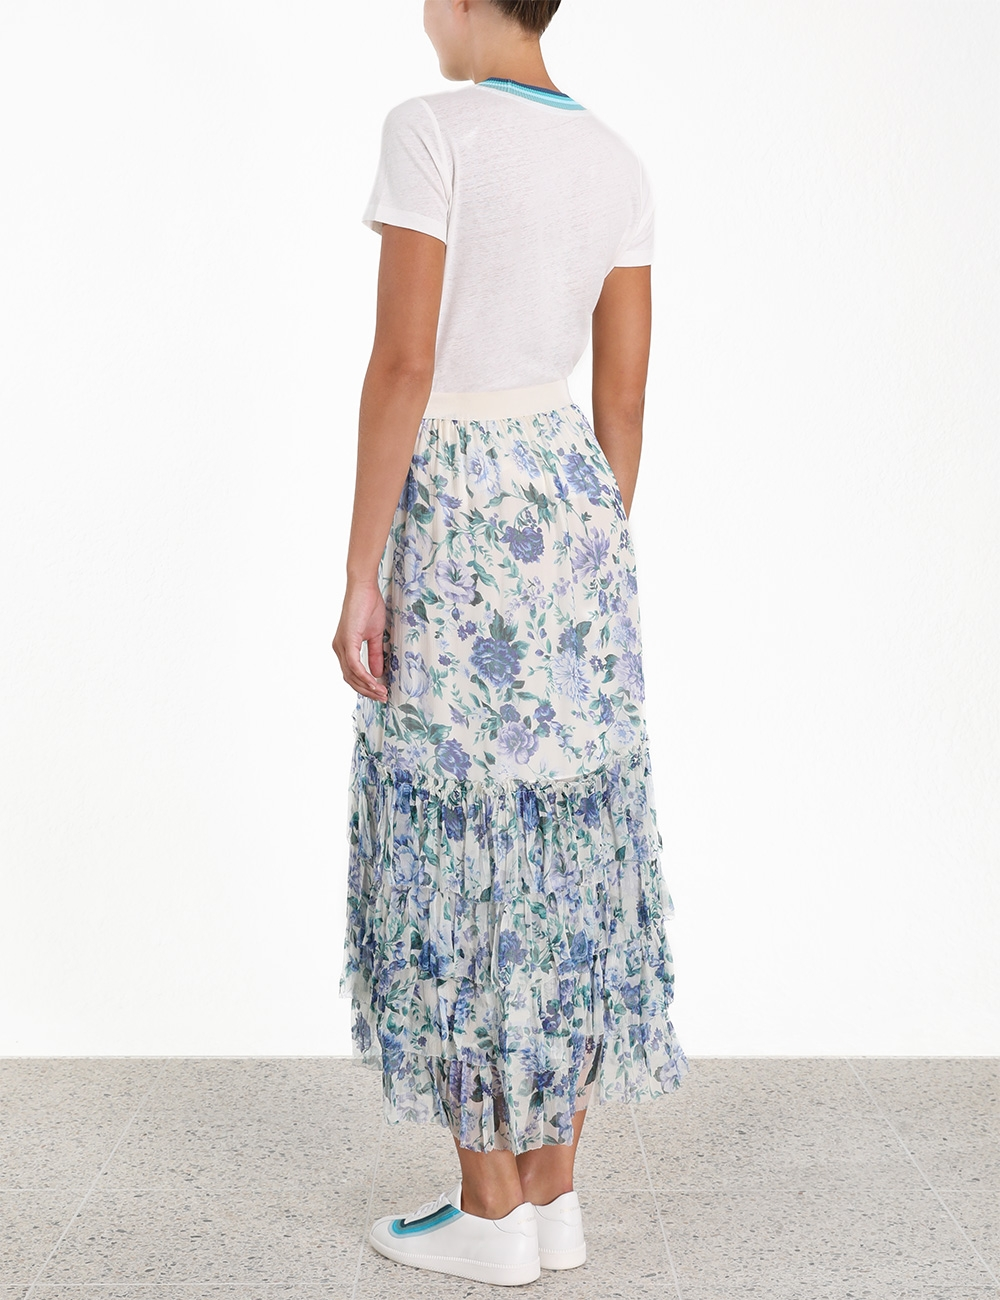 Moncur Chevron Frill Skirt